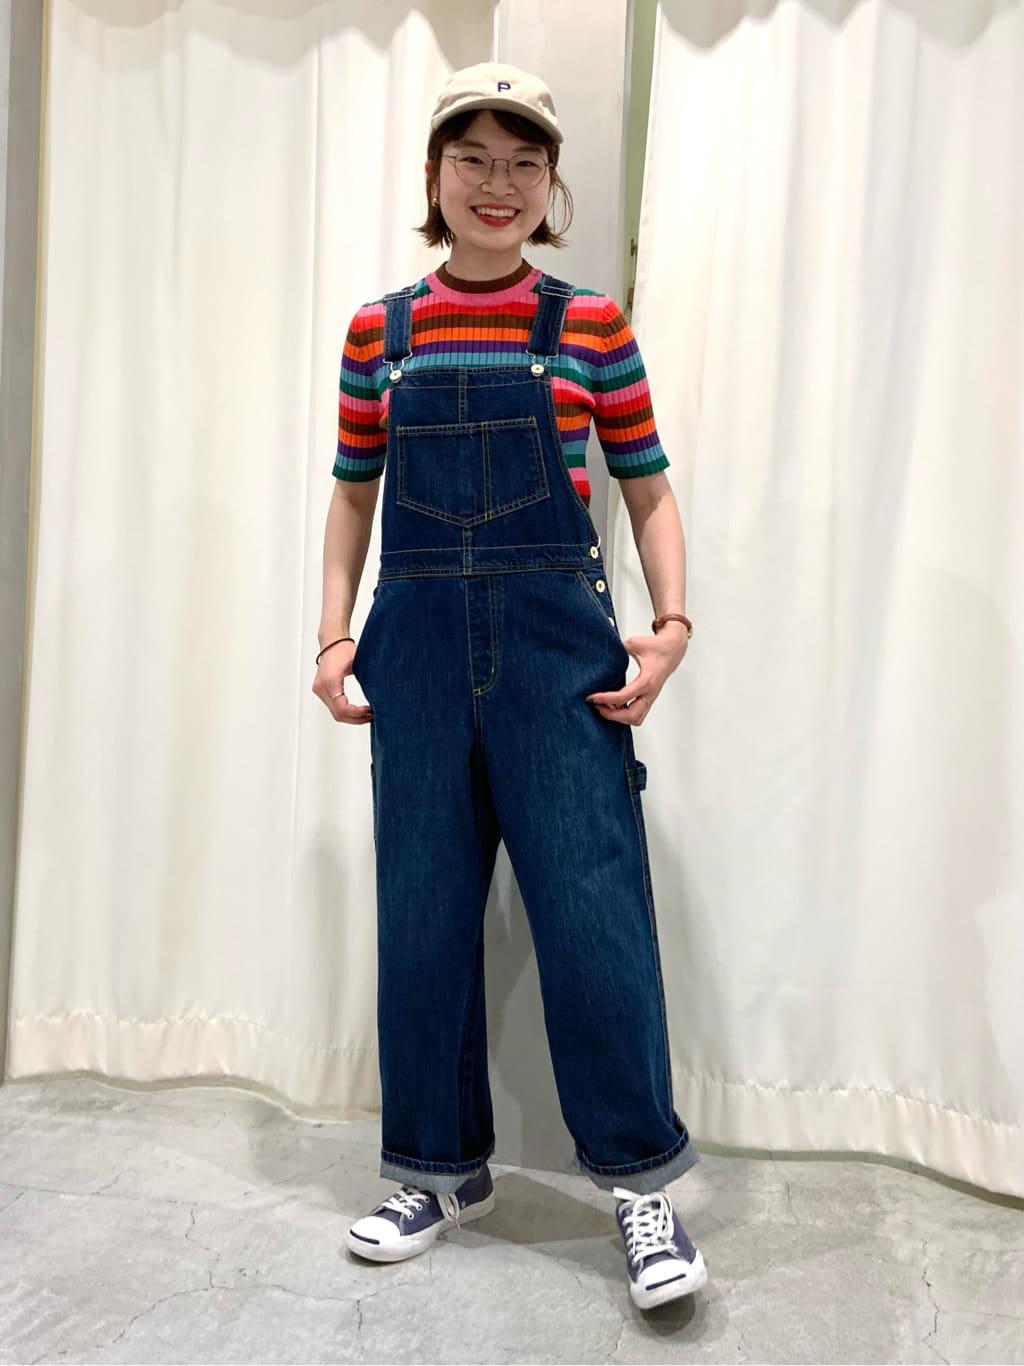 - CHILD WOMAN CHILD WOMAN , PAR ICI ルミネ池袋 身長:160cm 2021.08.23